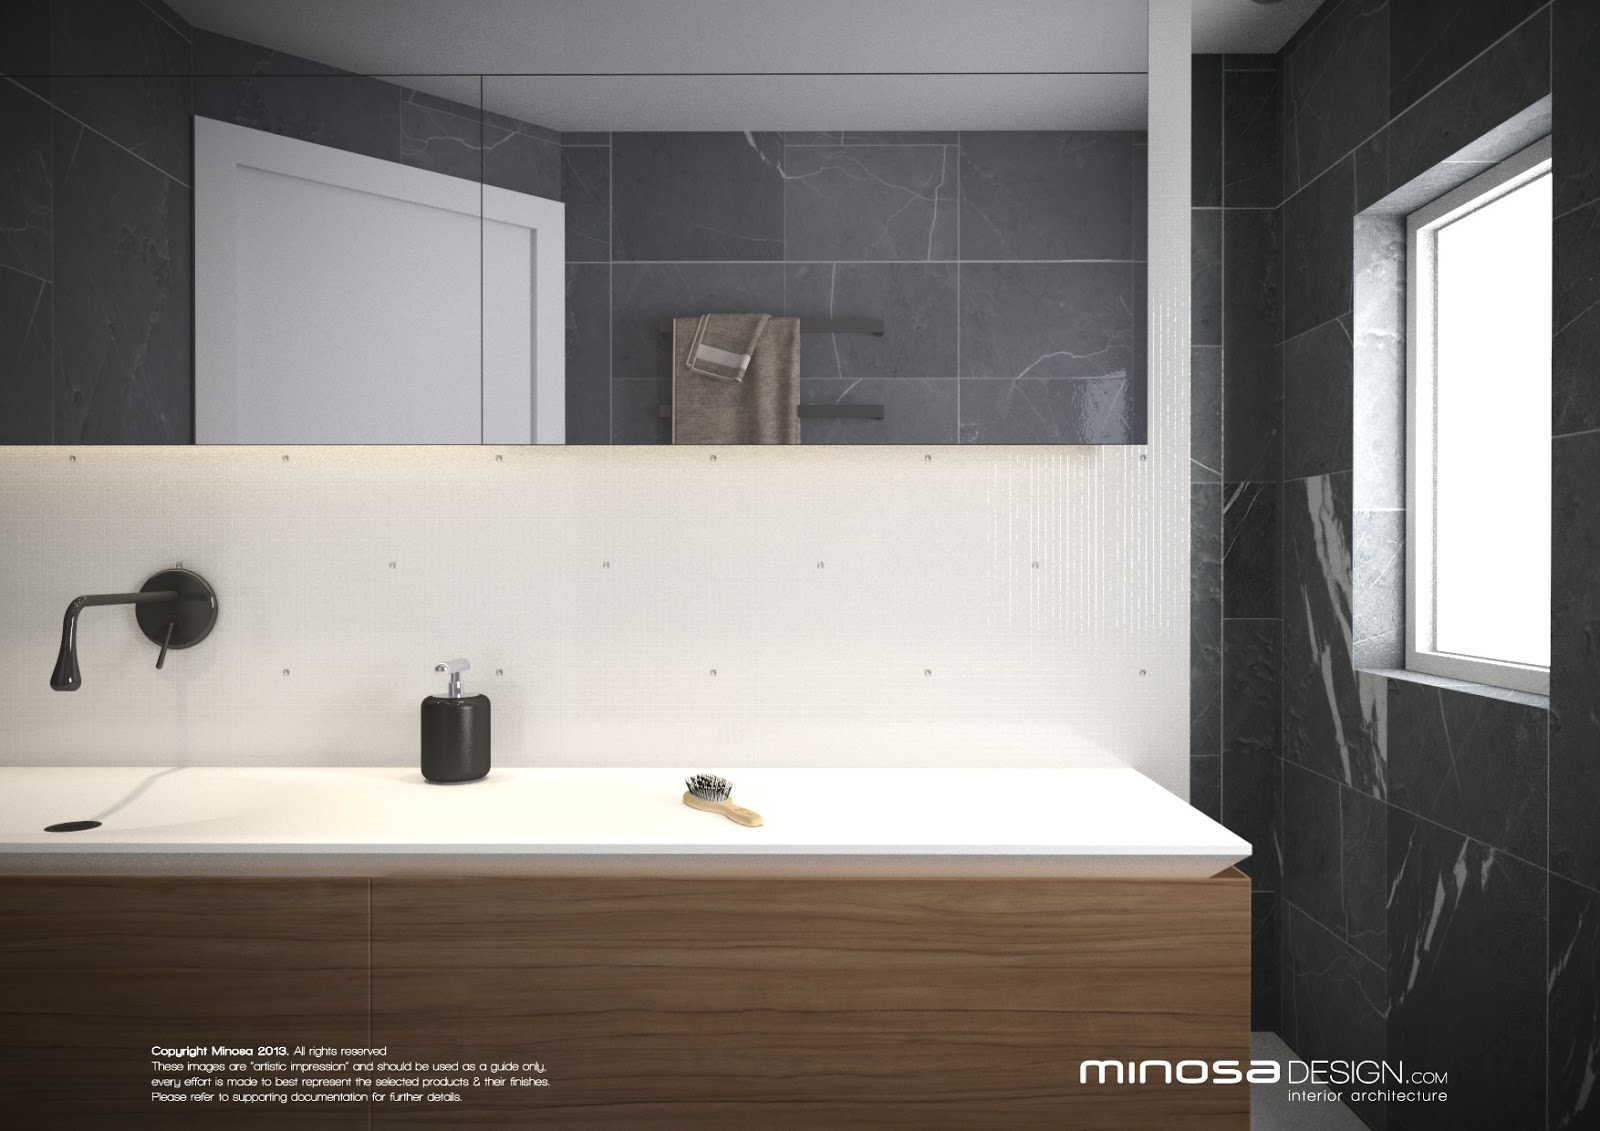 Minosa: Small modern bathroom to share